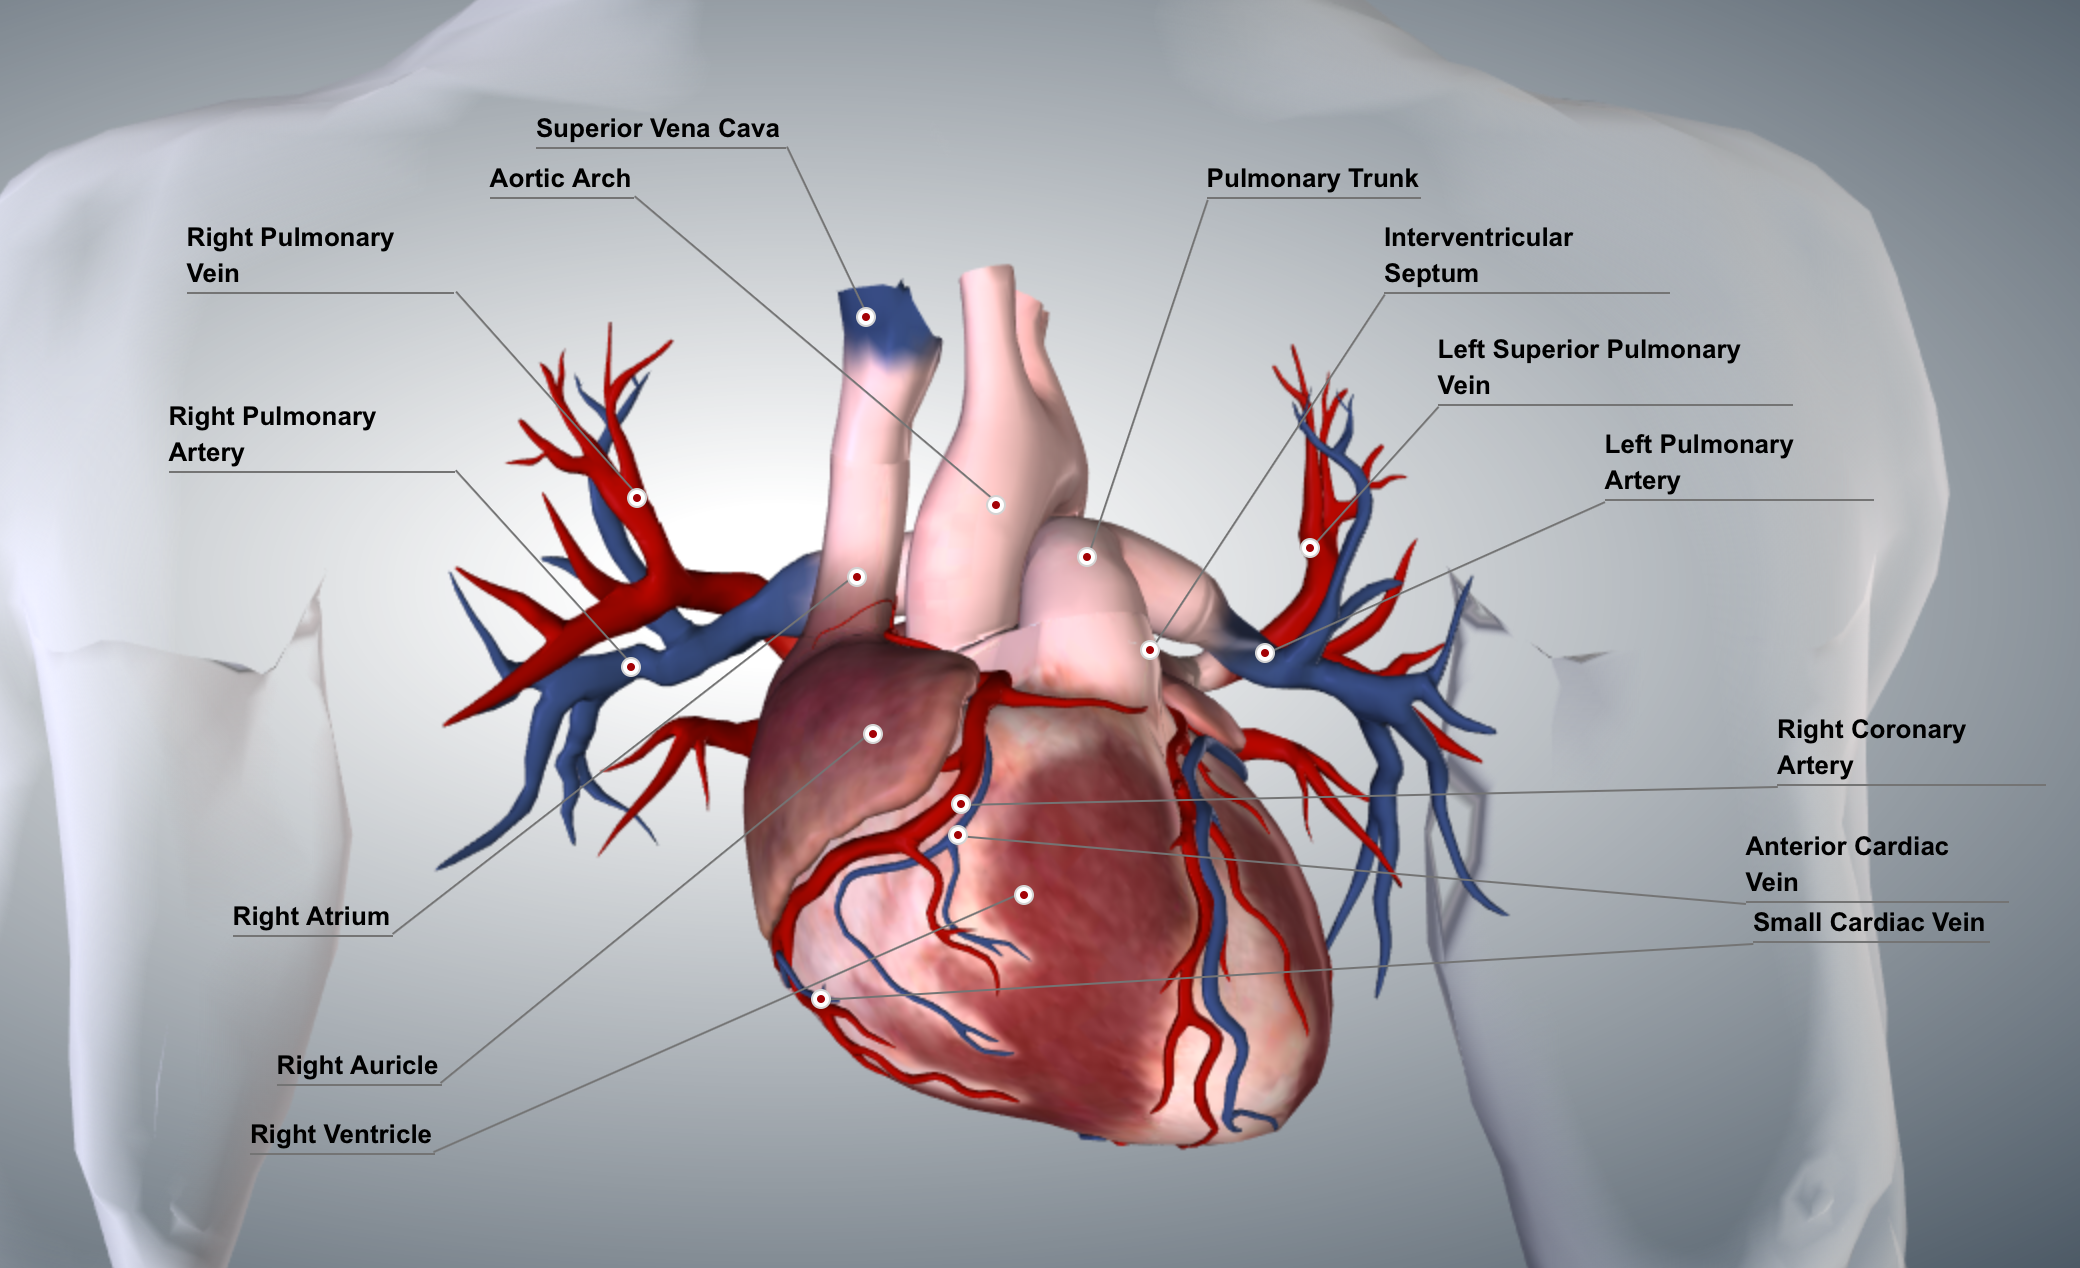 Simple Diagram of the Heart | Heart diagram, Arteries ...